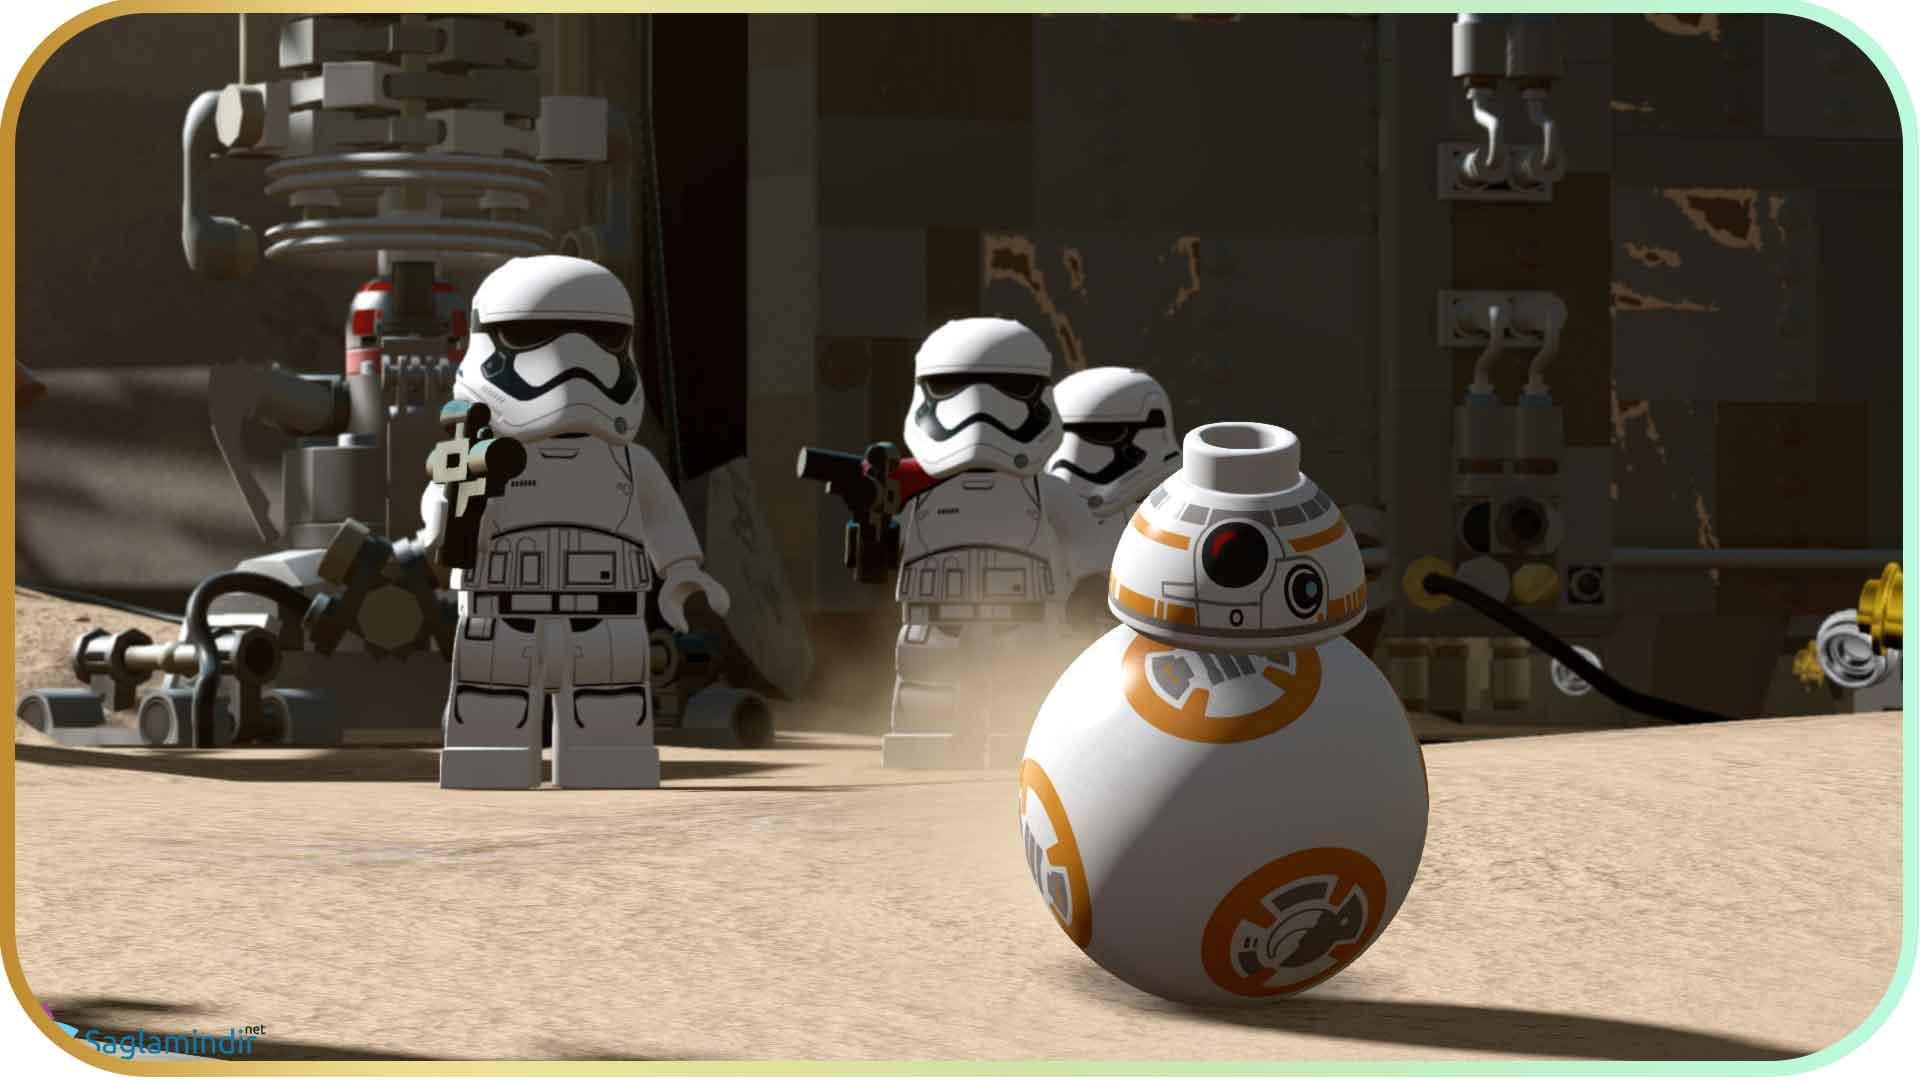 LEGO Star Wars The Force Awakens saglamindir